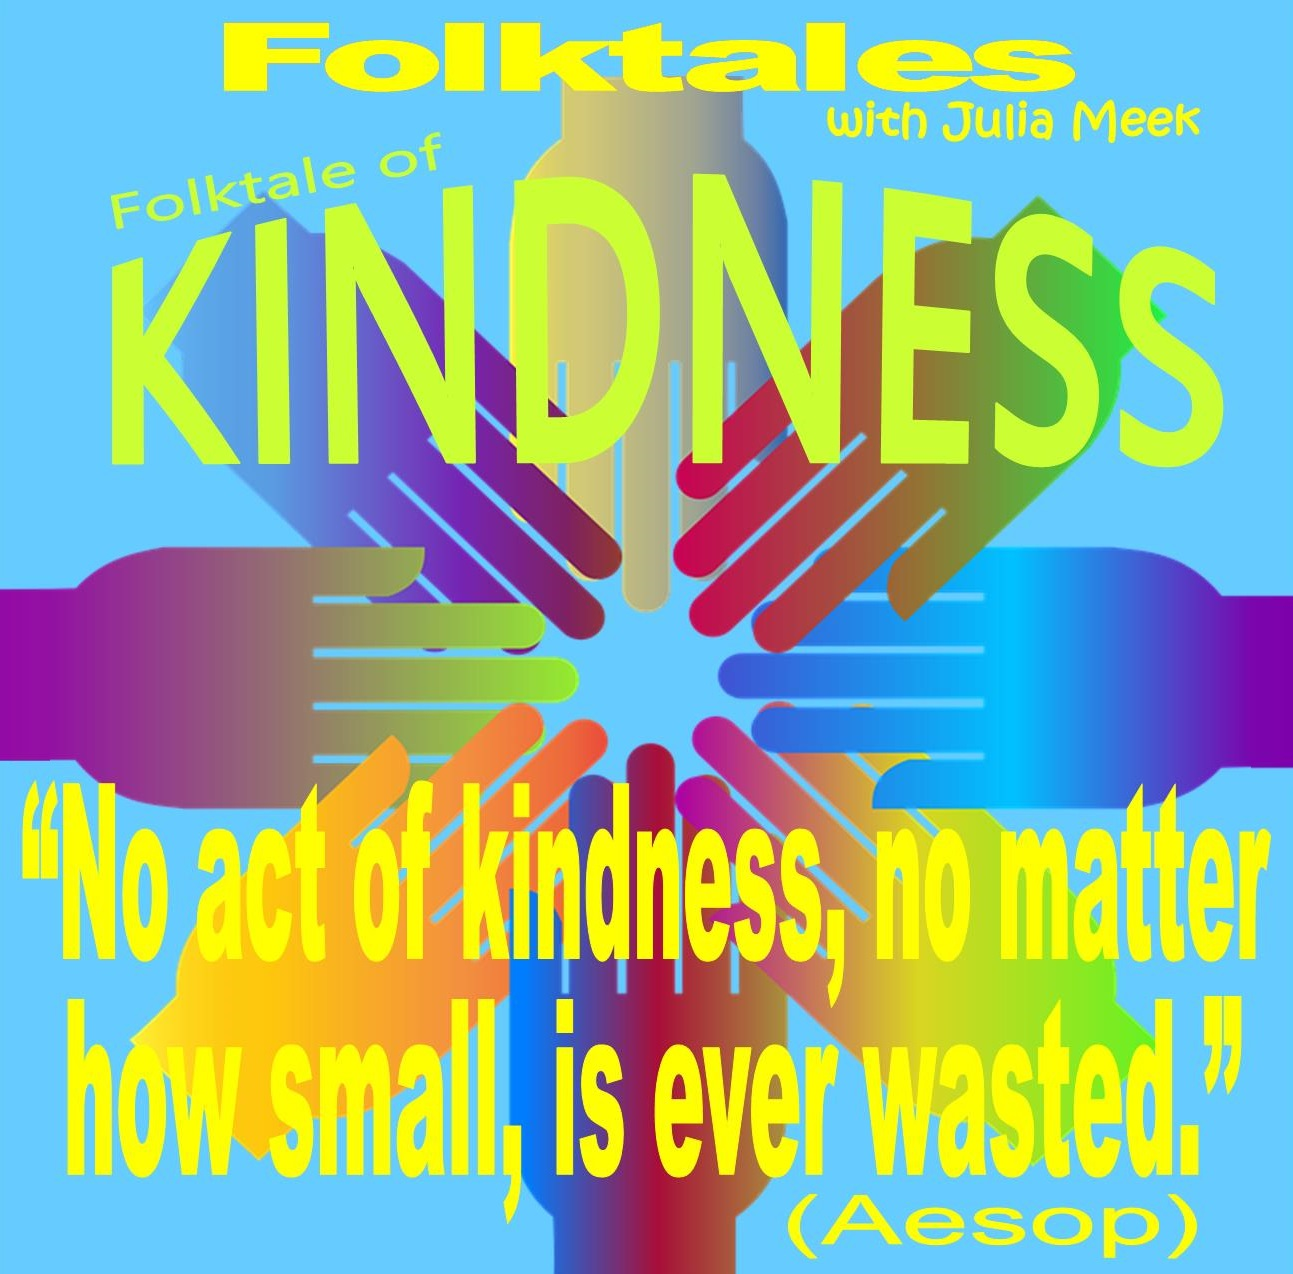 Caption: WBOI's Folktale of Kindness, Credit: Julia Meek